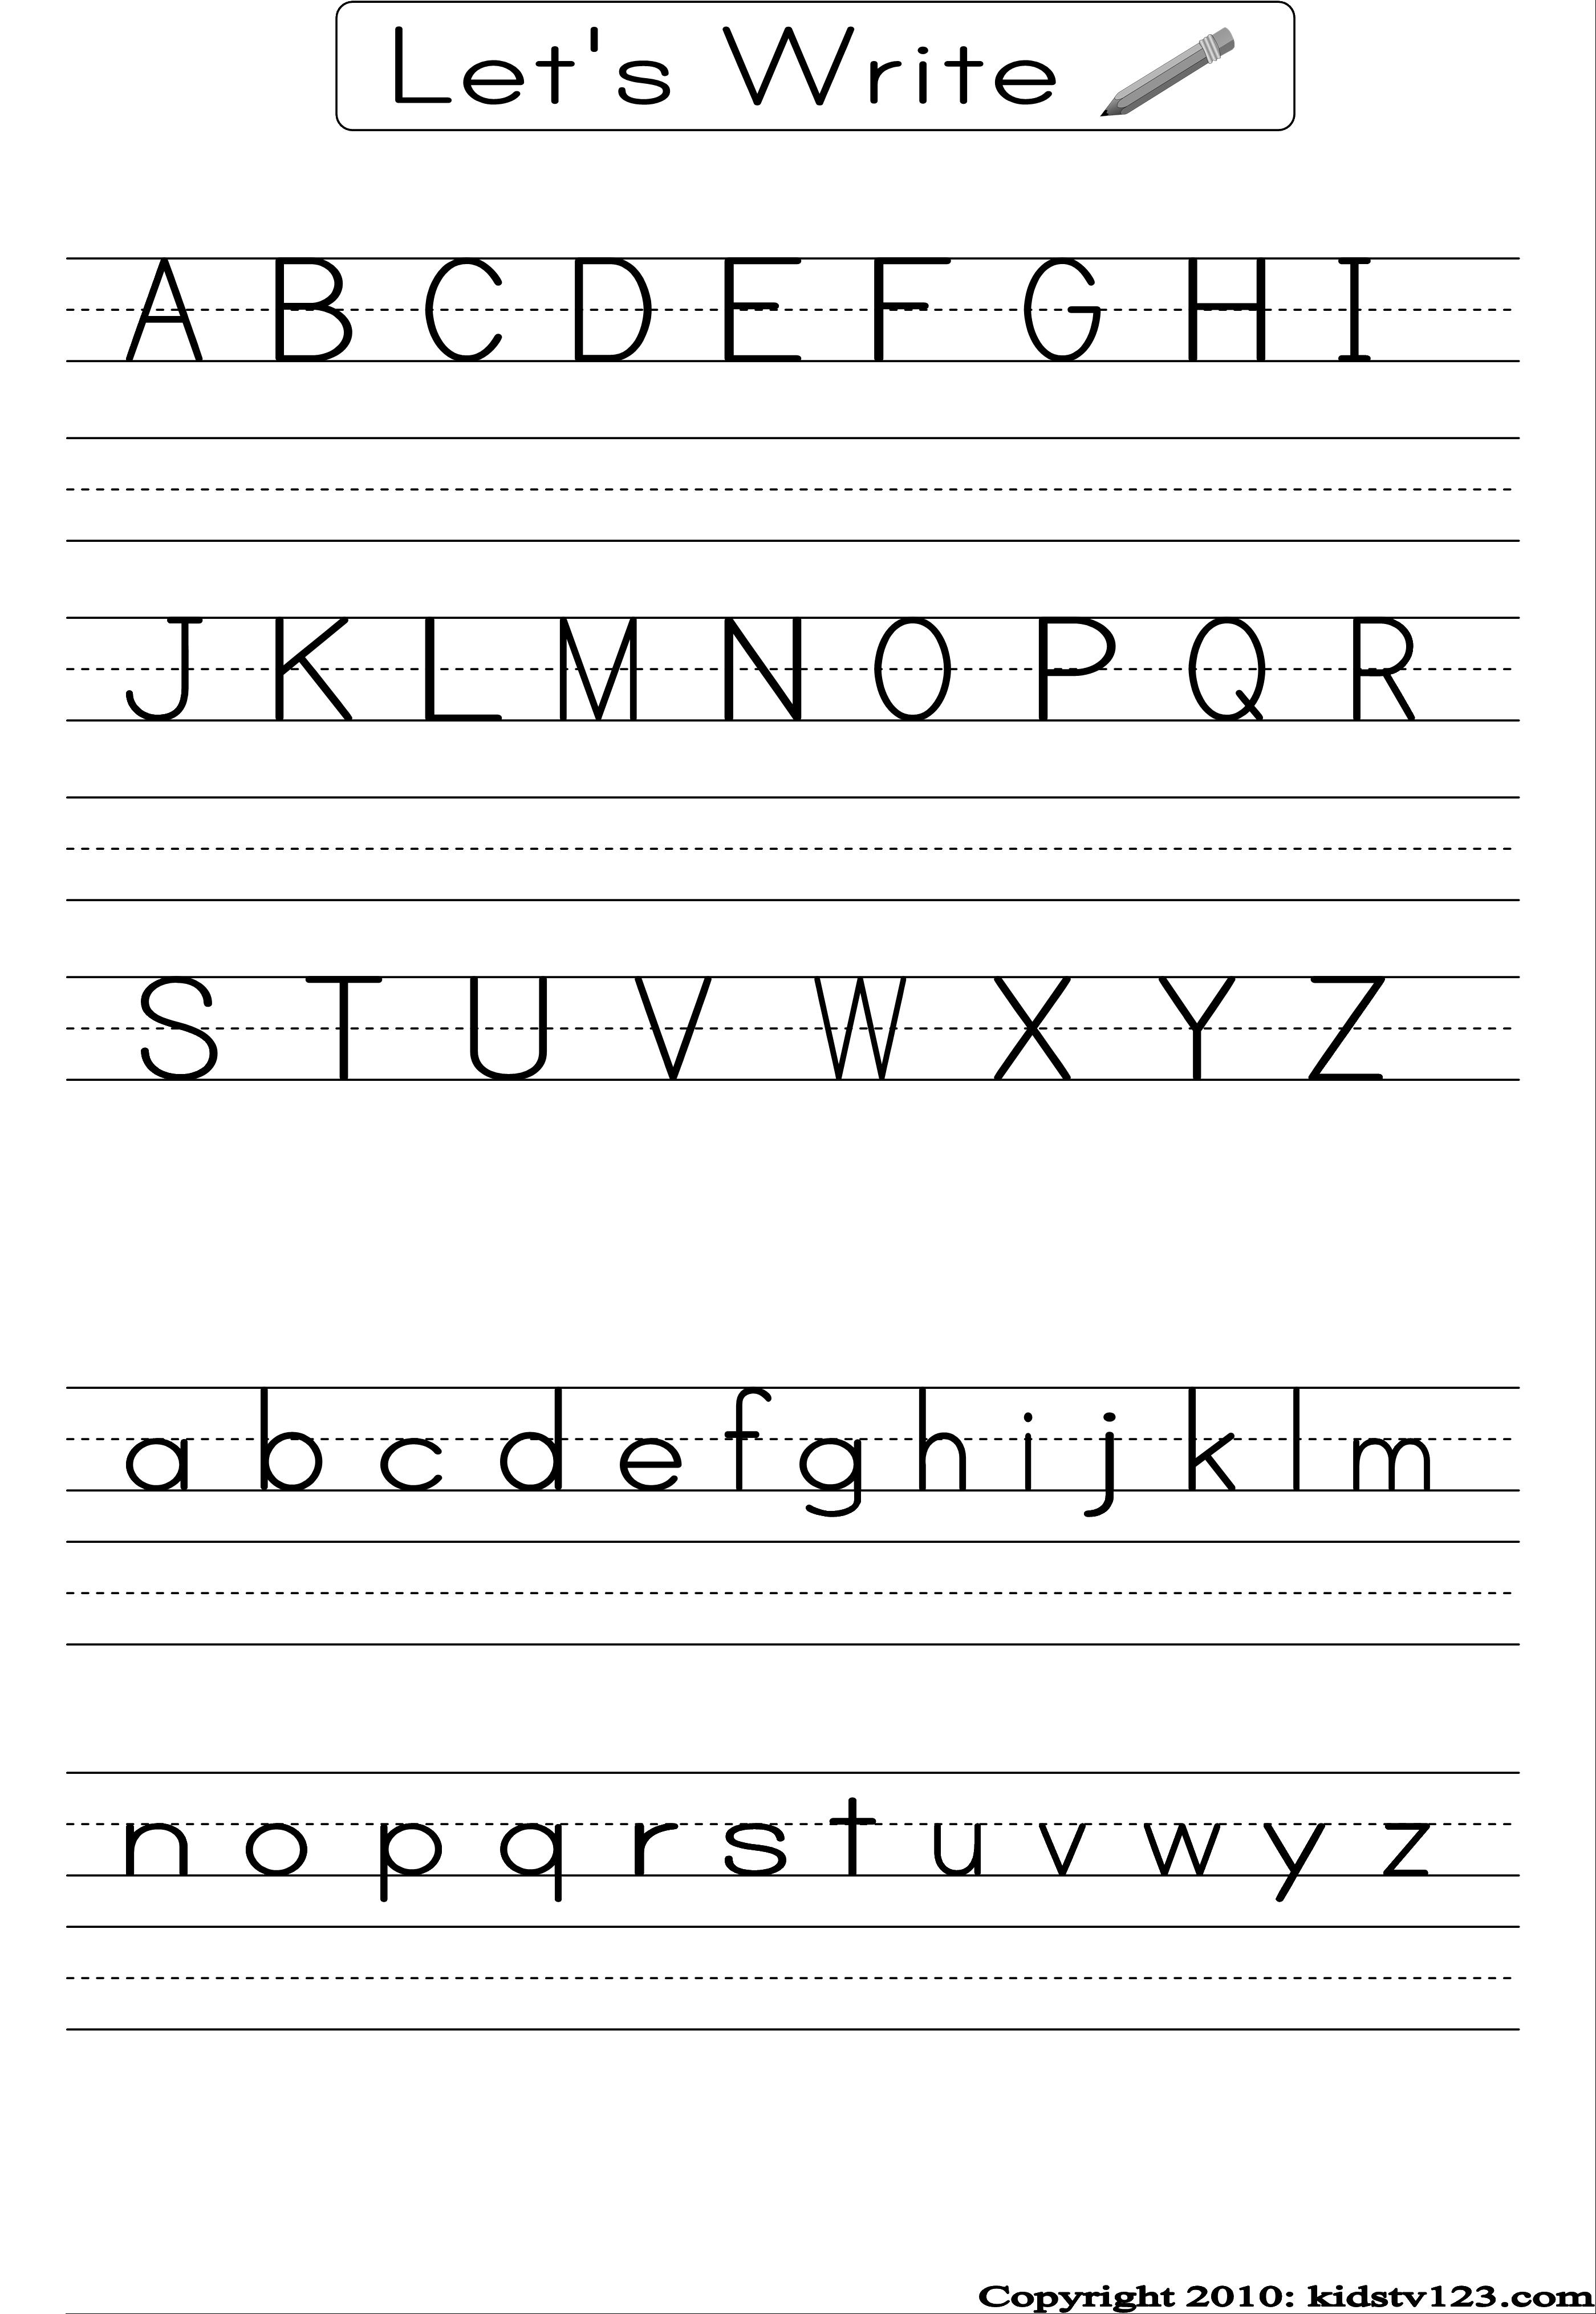 medium resolution of 897502e4311627d8b756184483c0d2ea.png (2799×4057)   Alphabet writing  practice